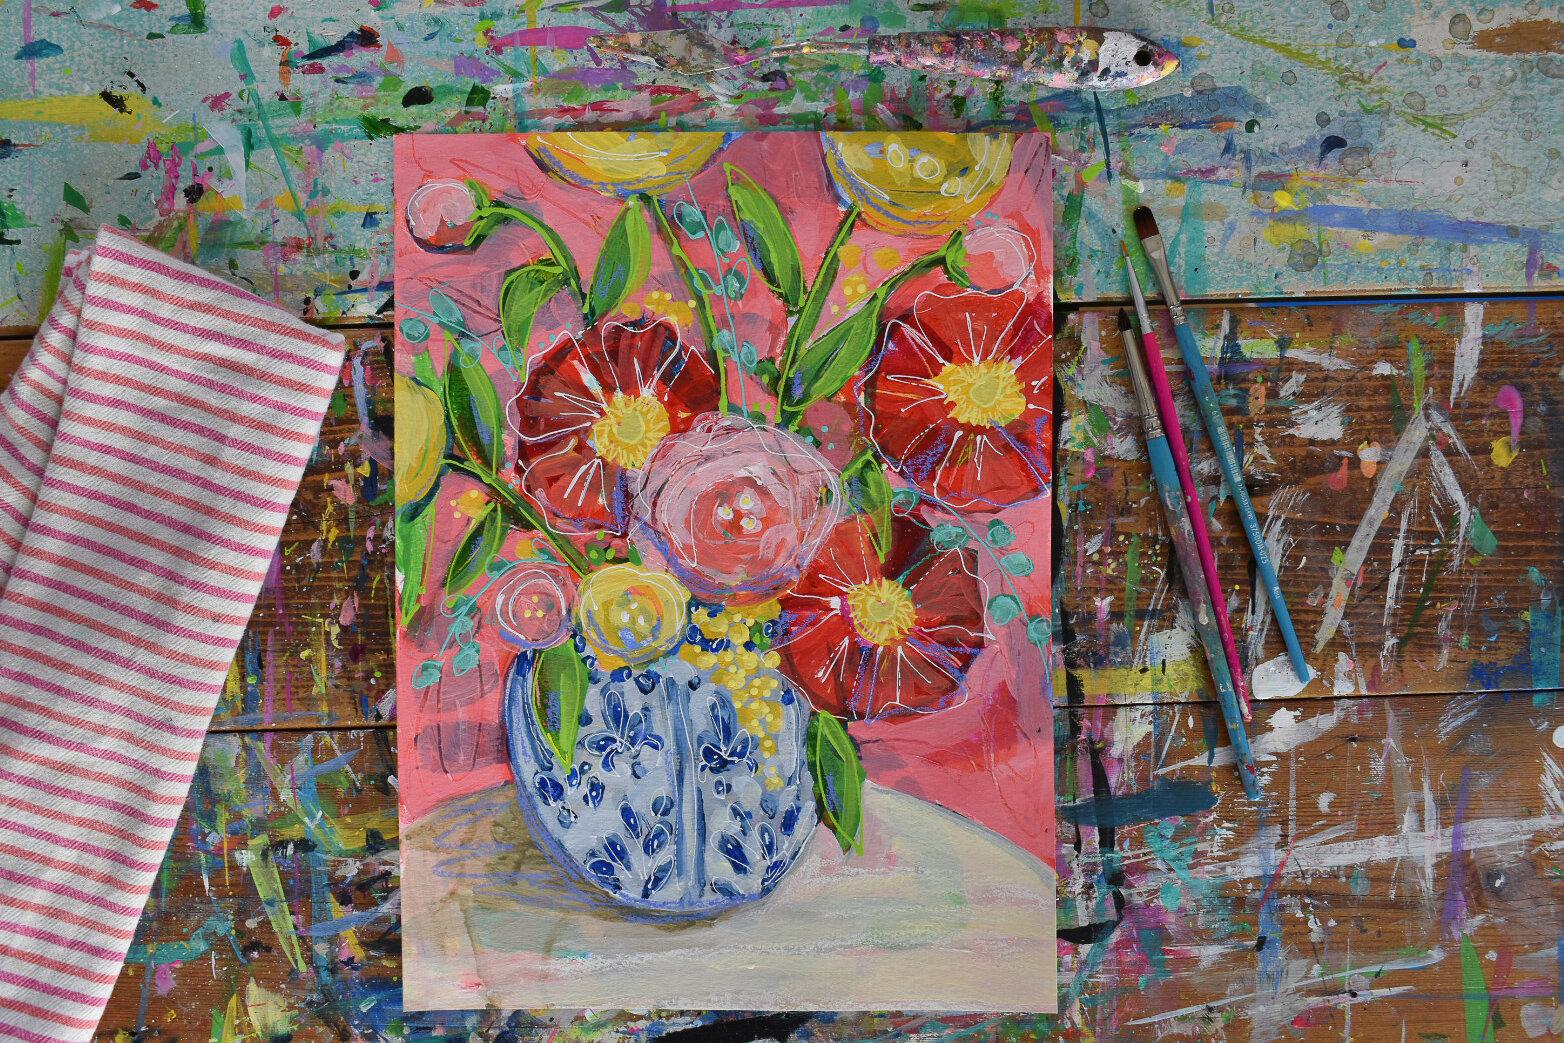 boho_flowers_painting_eclectic_art_chinoserie_daisyfaithart_4.jpg